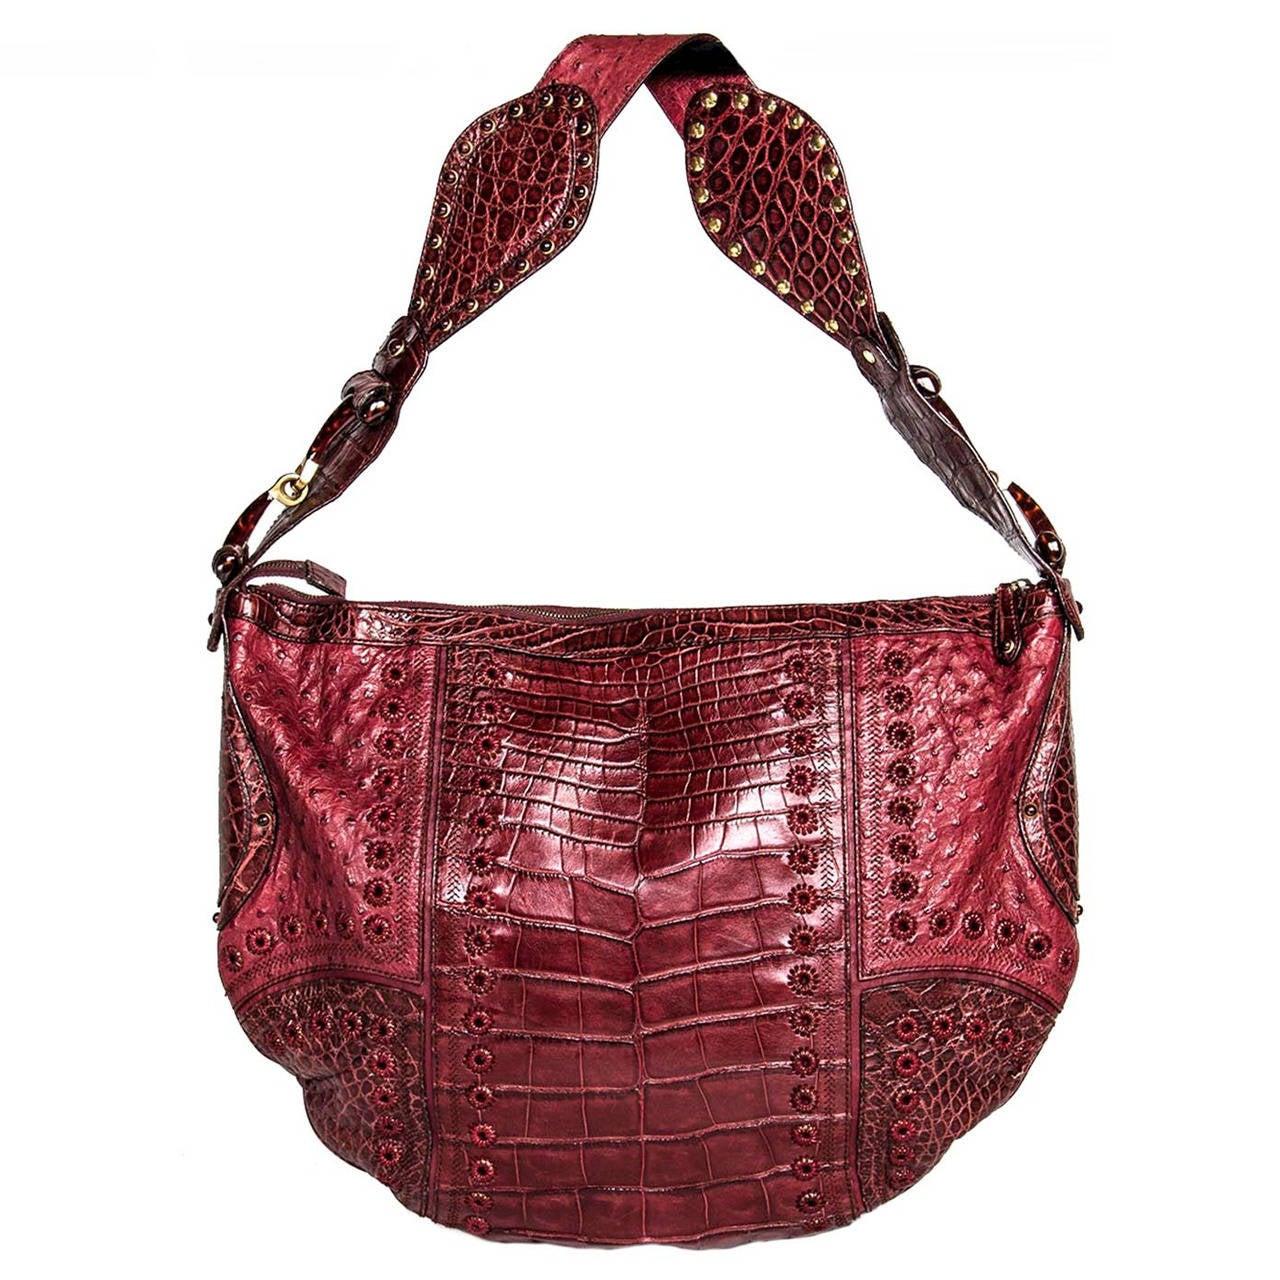 Gucci Burgundy Crocodile And Ostrich Patchwork Bag